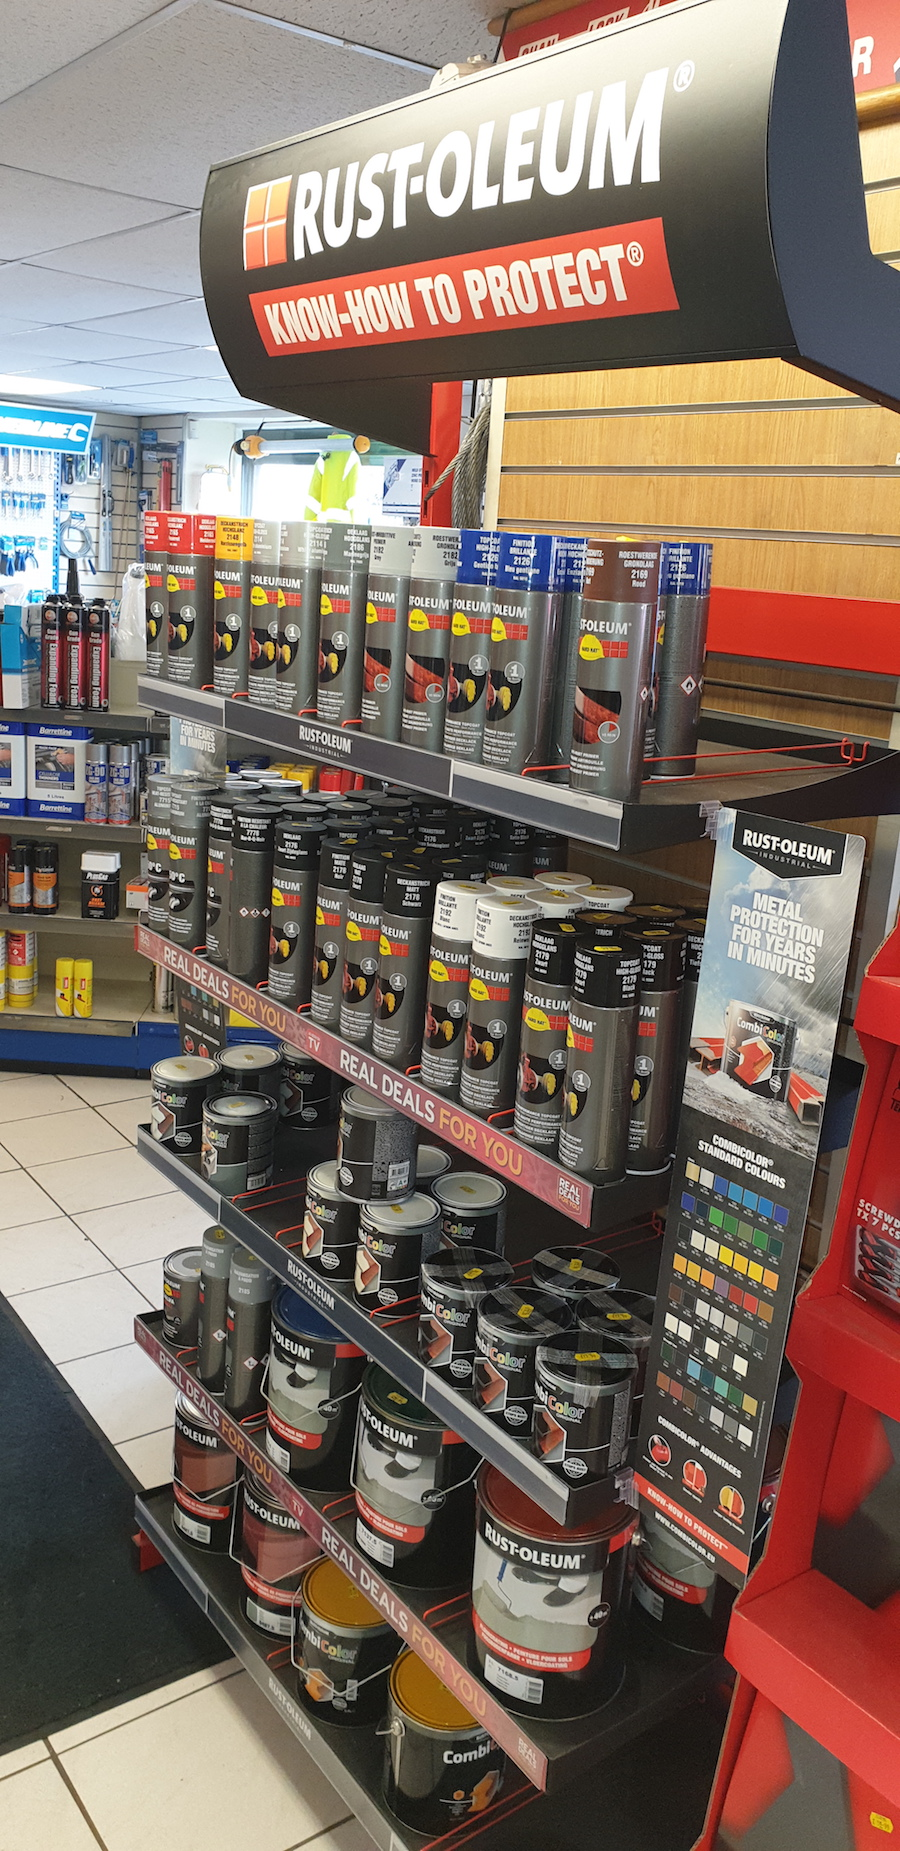 rust-oleum products